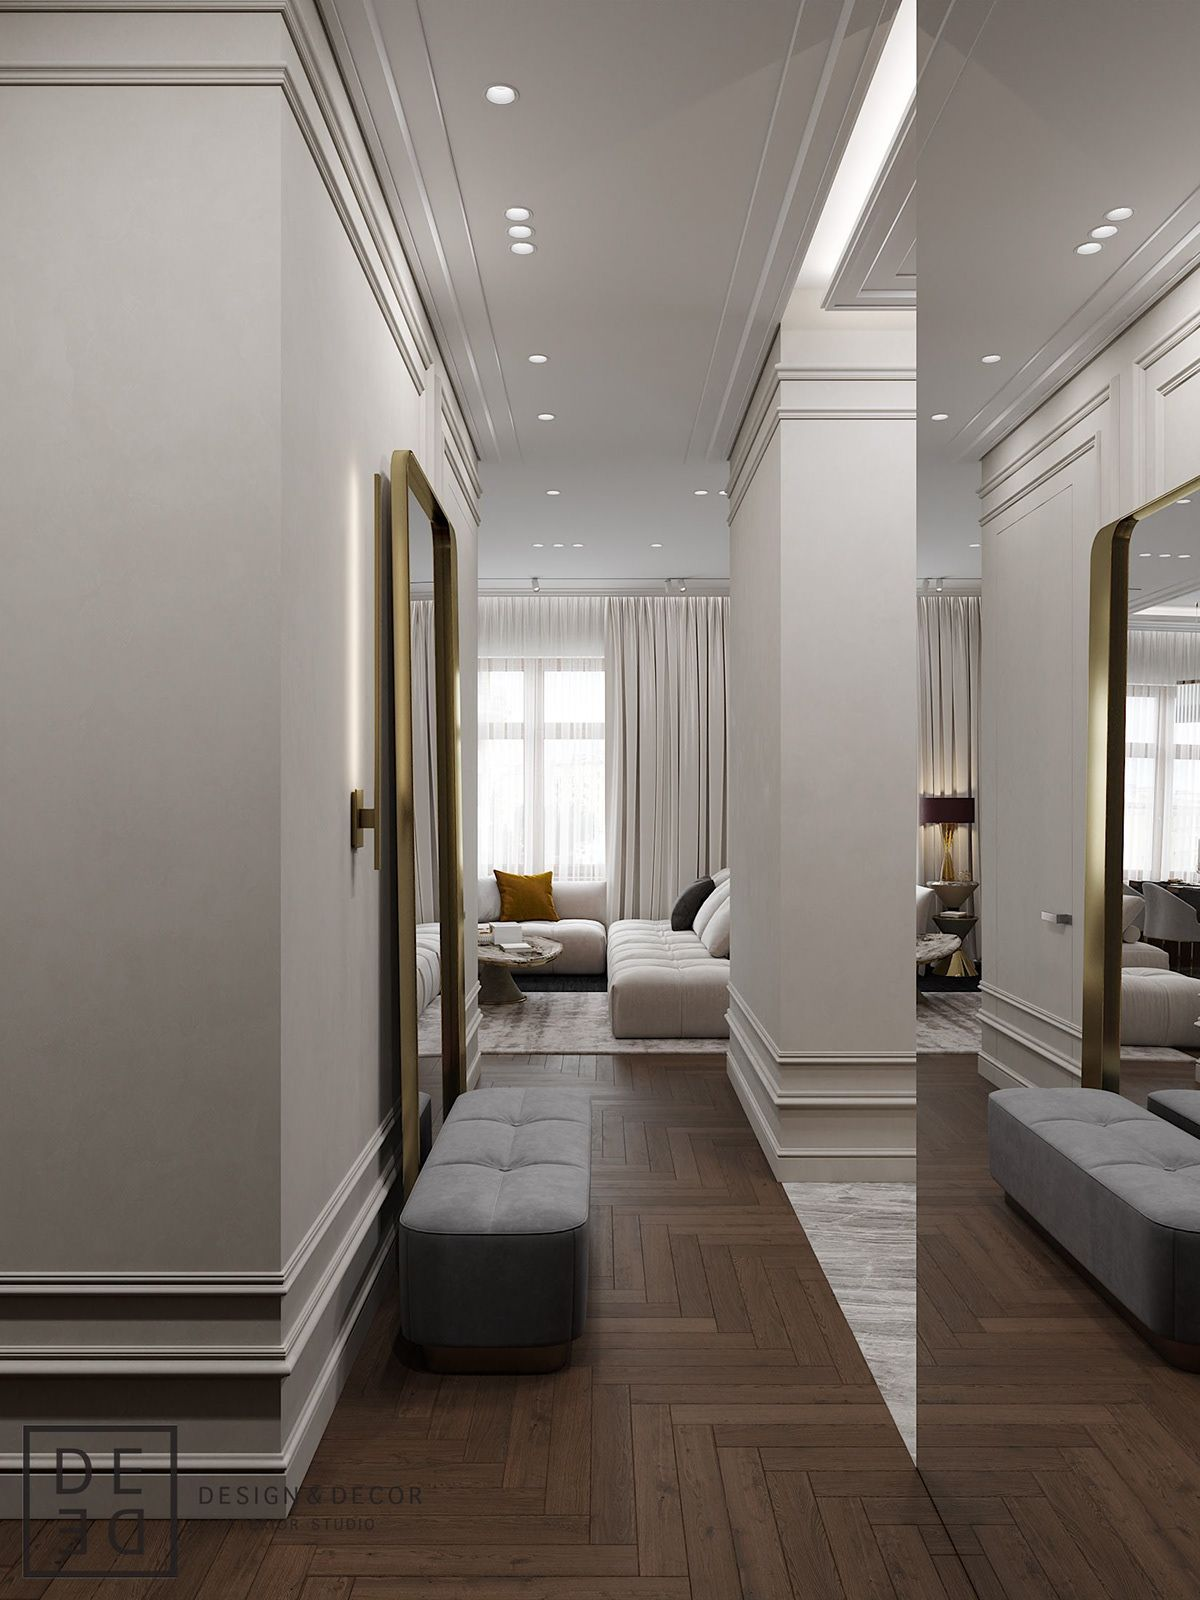 De De Fusion Apartment On Behance S Izobrazheniyami Dizajn